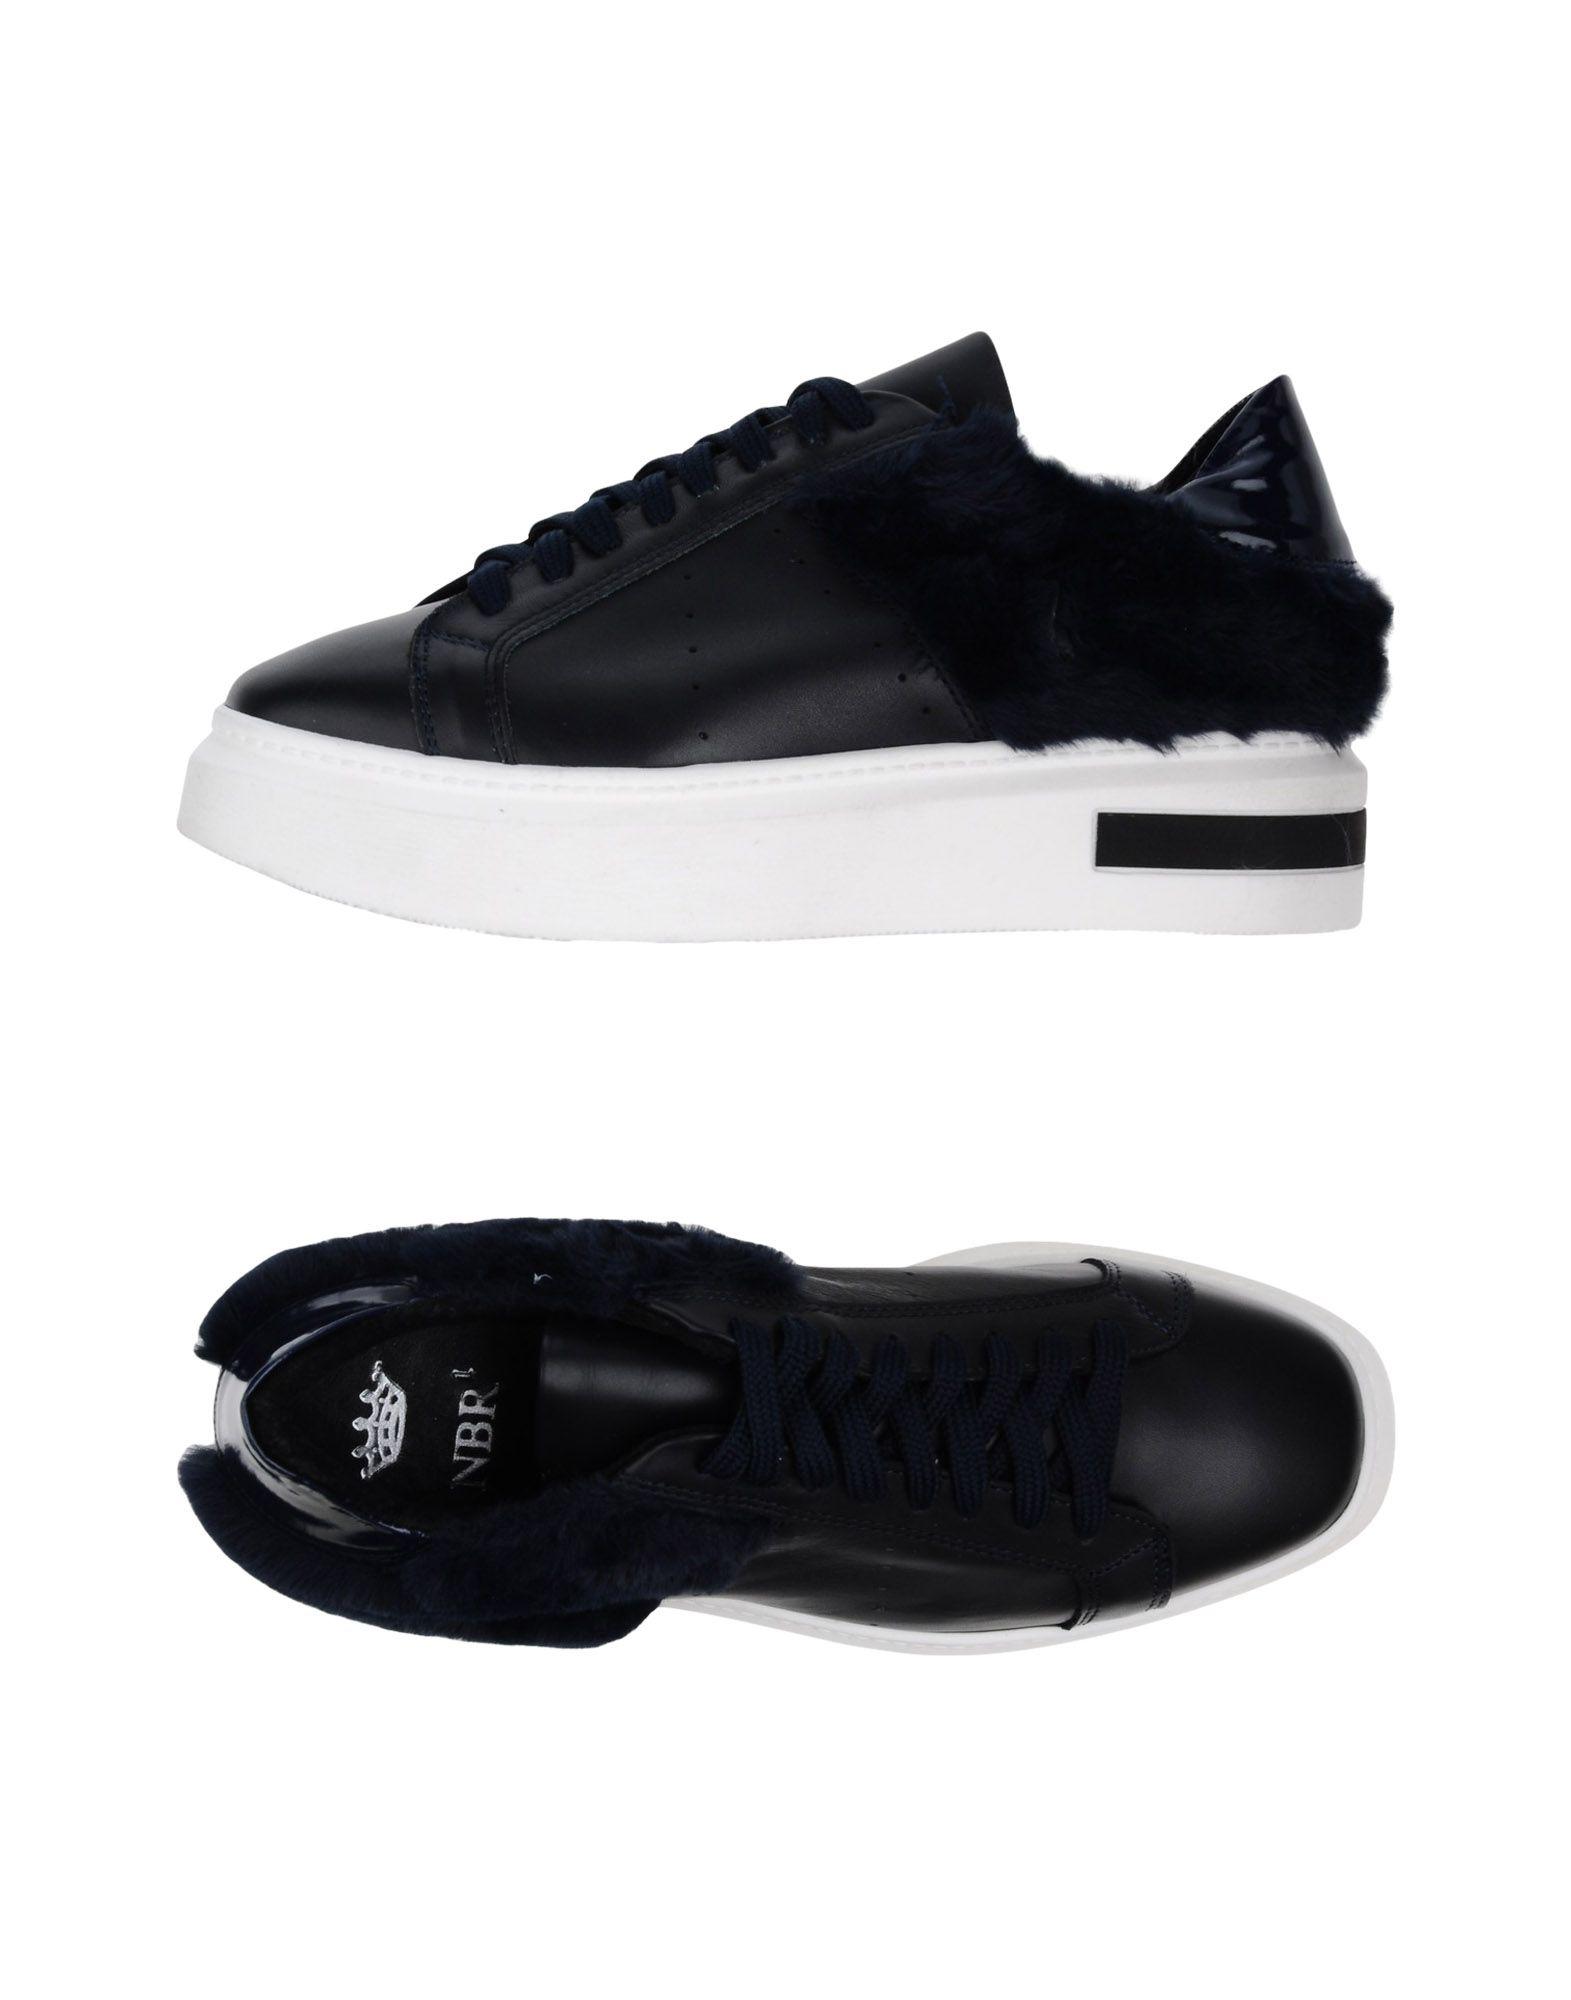 Sneakers Nbr¹ Femme - Sneakers Nbr¹ sur